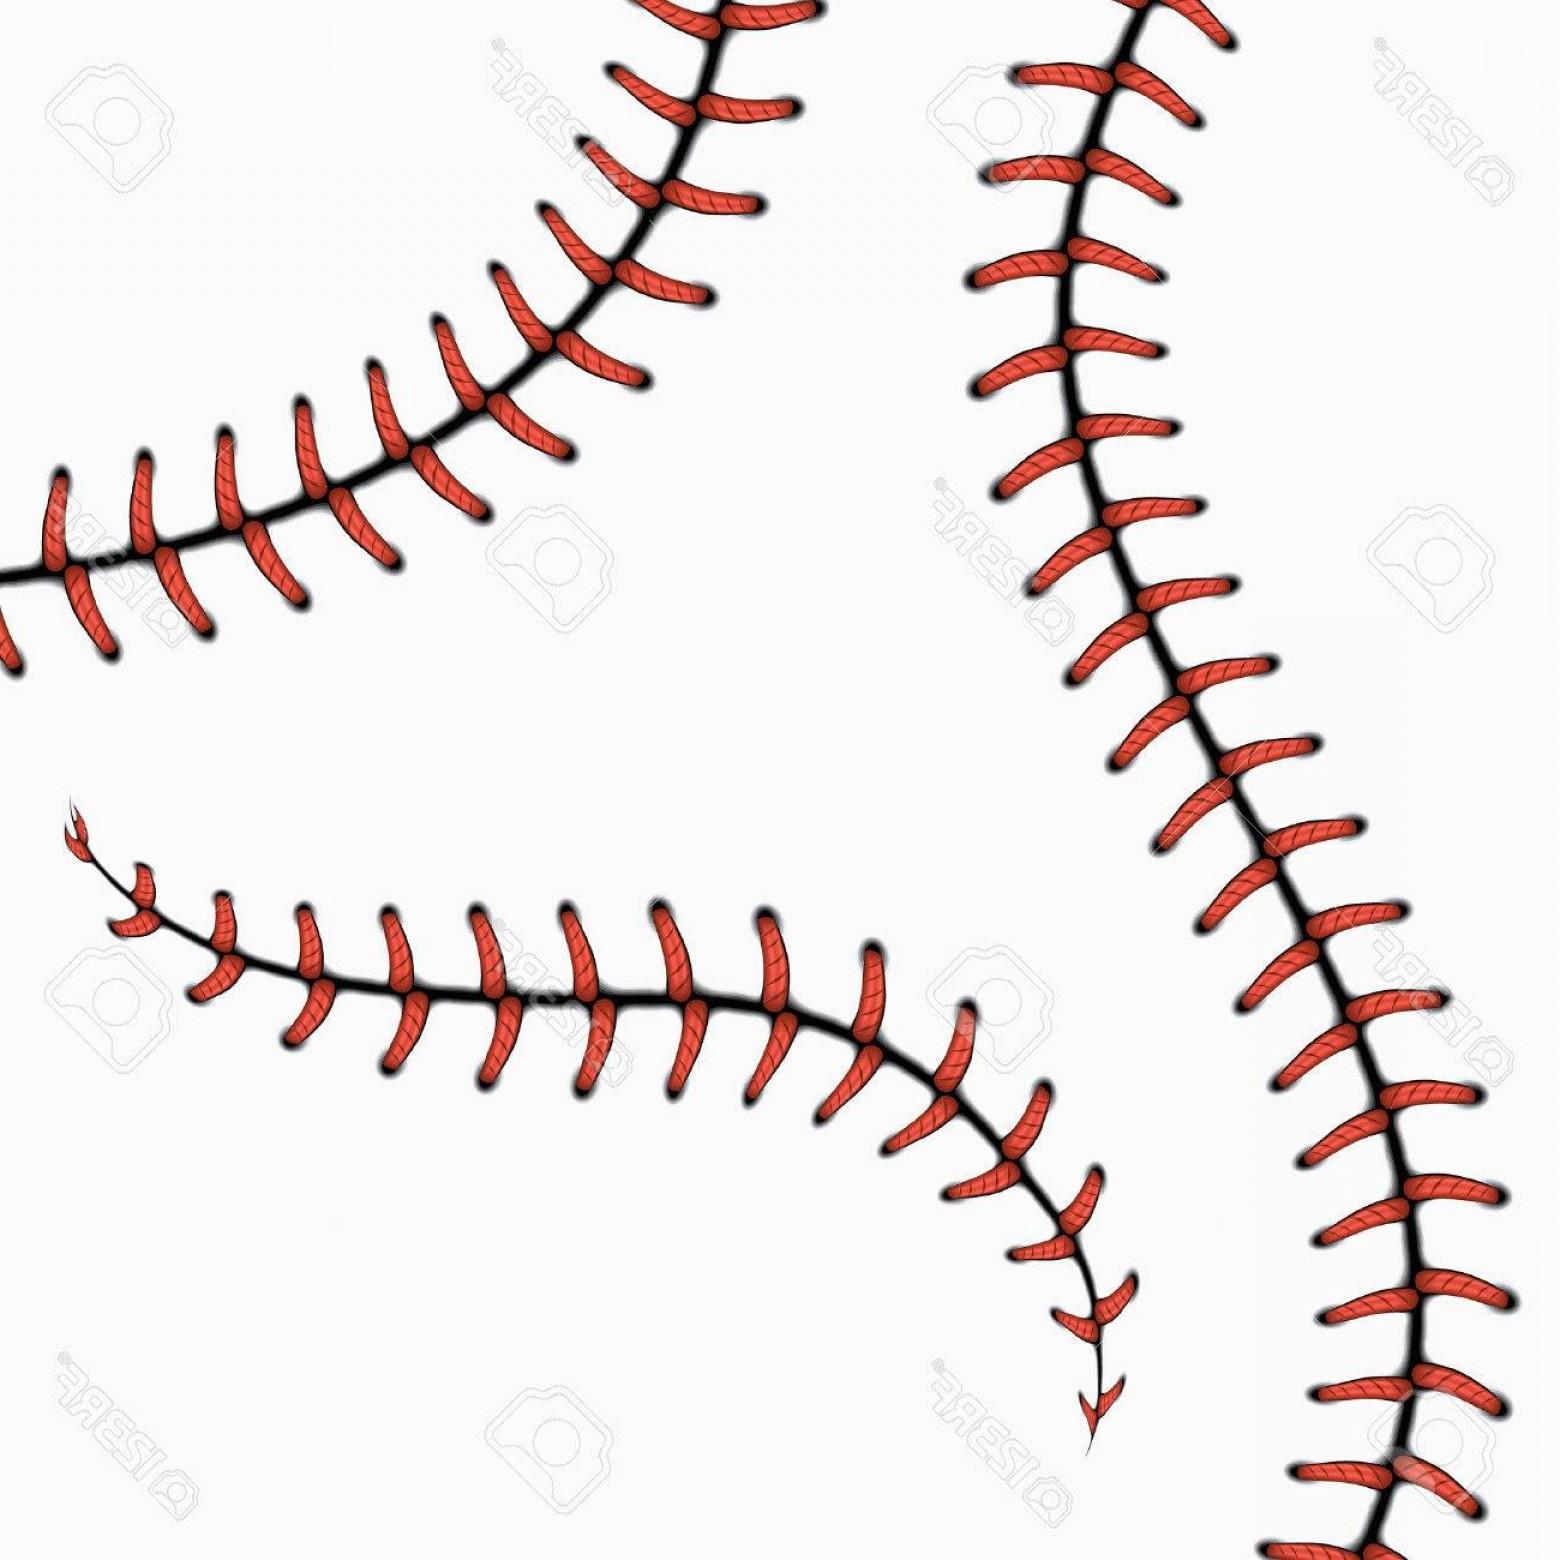 Photostock Vector Baseball Stitches Softball Laces Isolated On White.